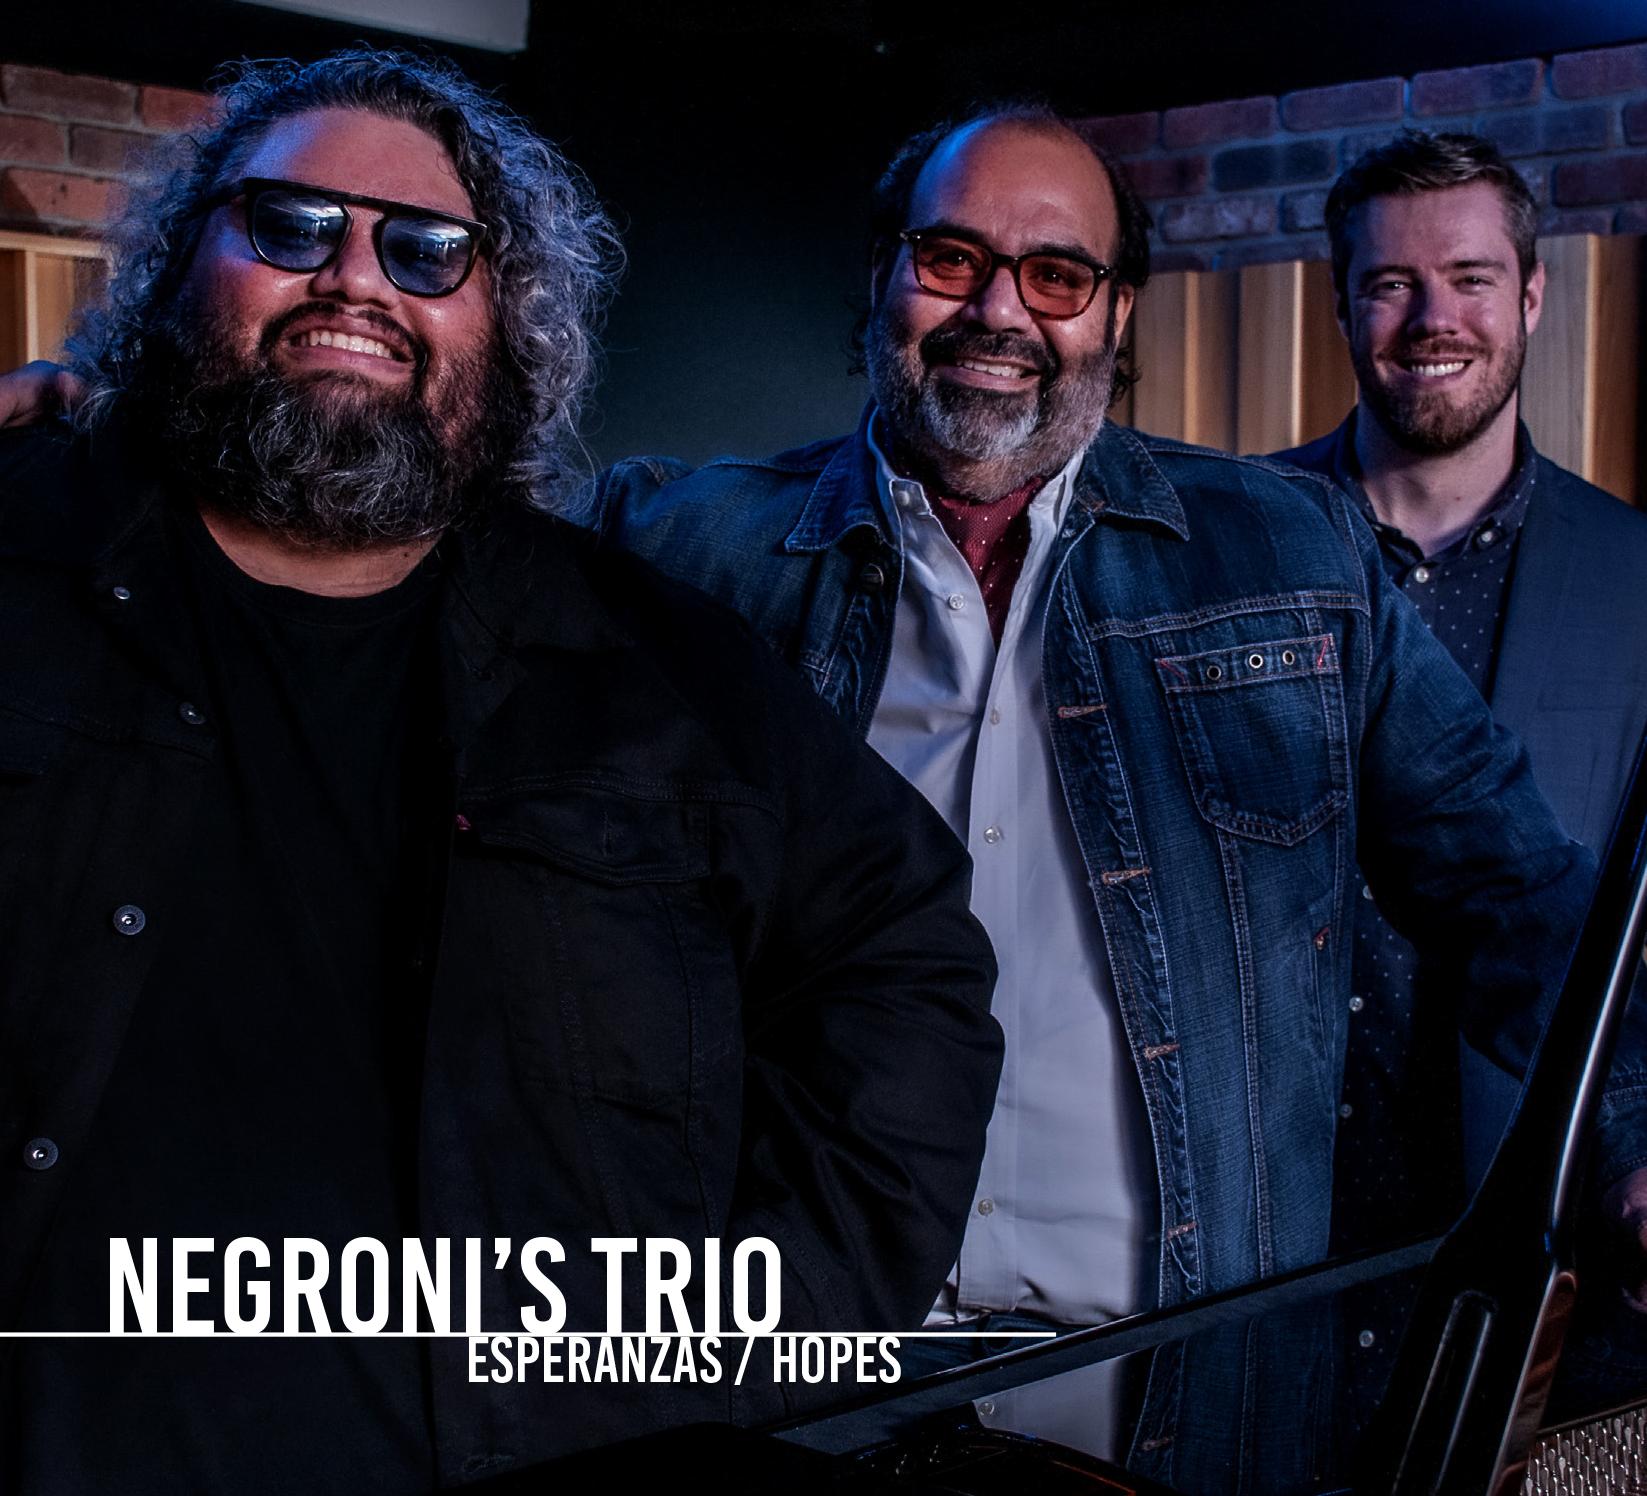 NEW RELEAE: Negroni's Trio's ESPERANZAS is out October 8, 2021 (Sony Music Latin)